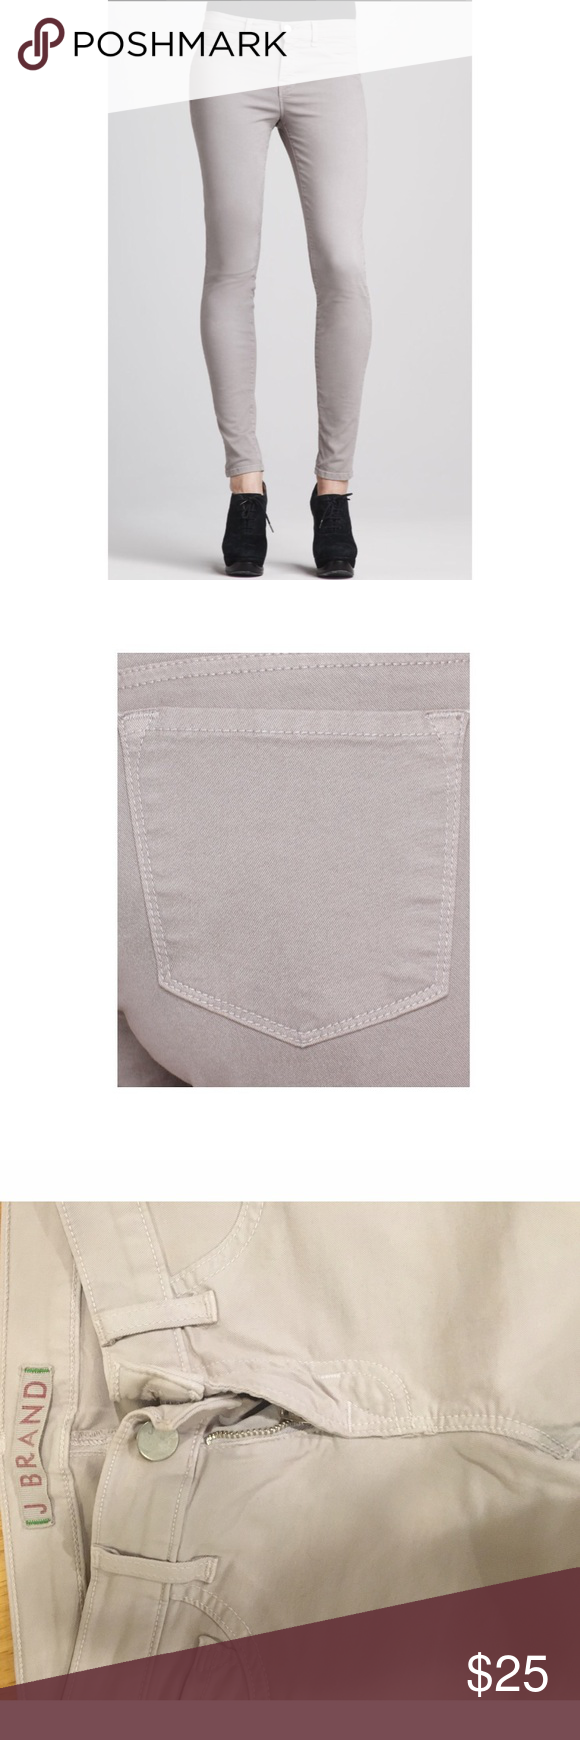 J brand twill J brand skinnies, French gray, size 25 J Brand Pants Skinny